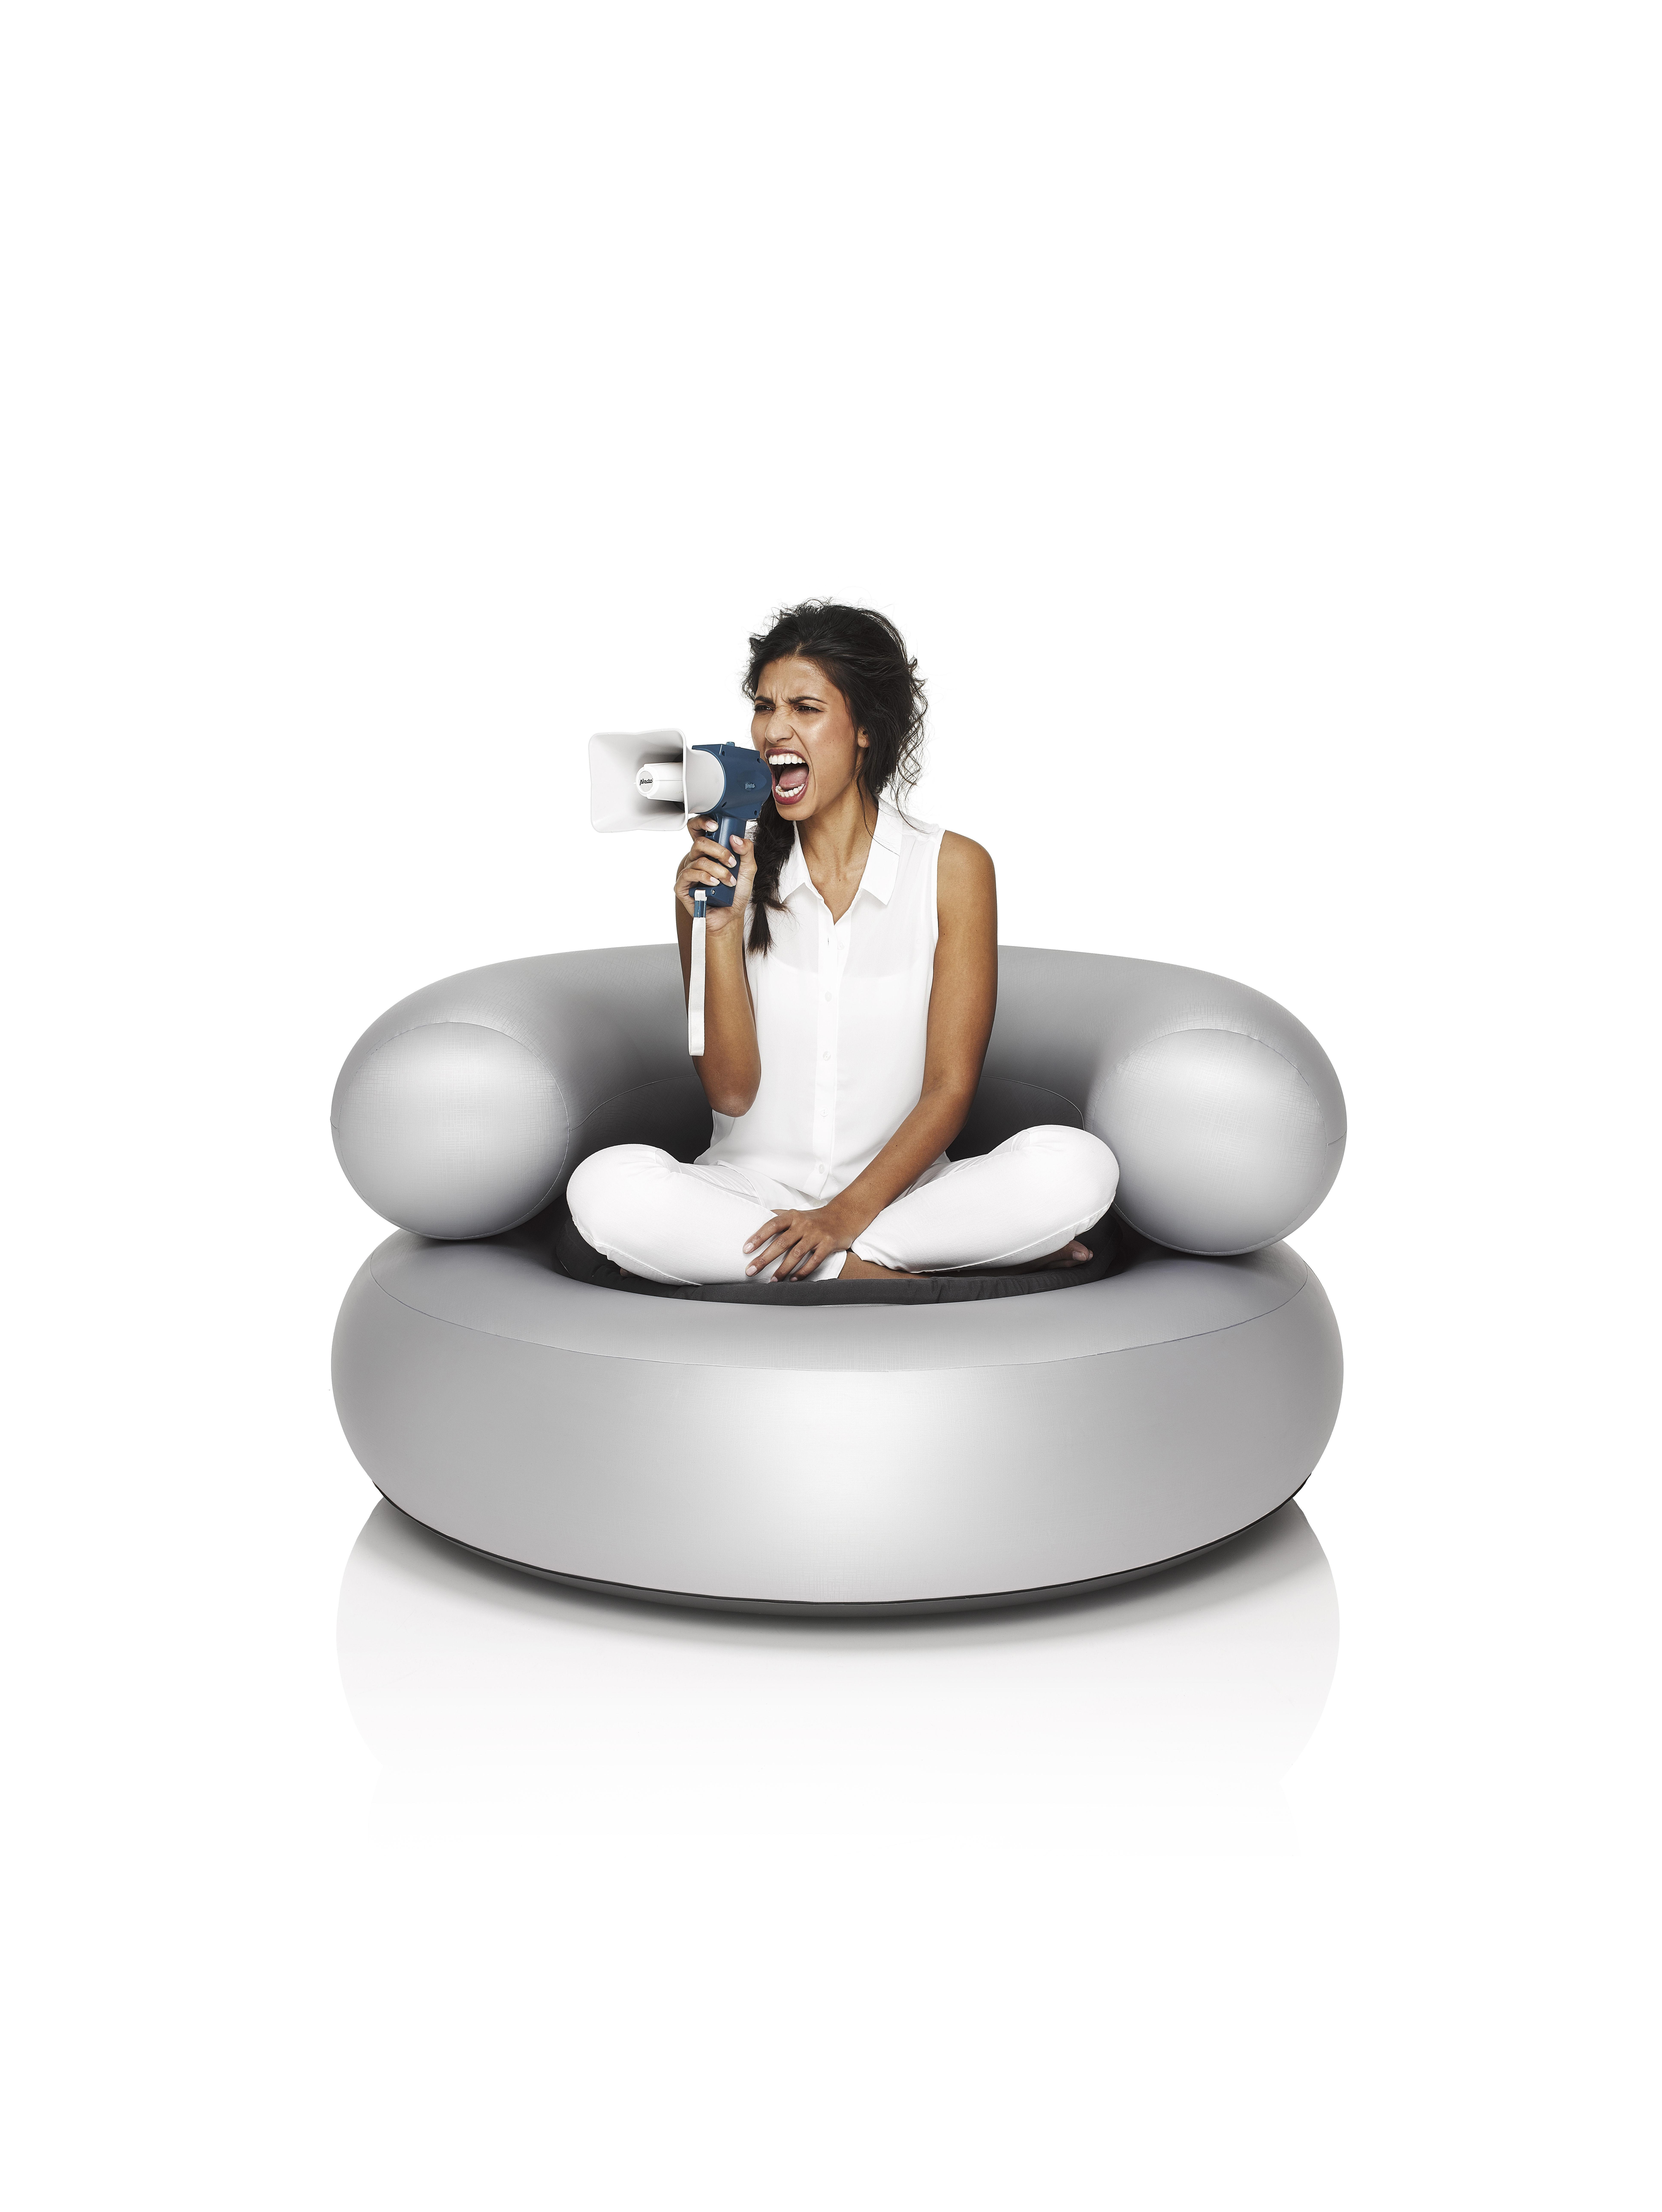 fauteuil gonflable ch air galette d 39 assise fauteuil. Black Bedroom Furniture Sets. Home Design Ideas